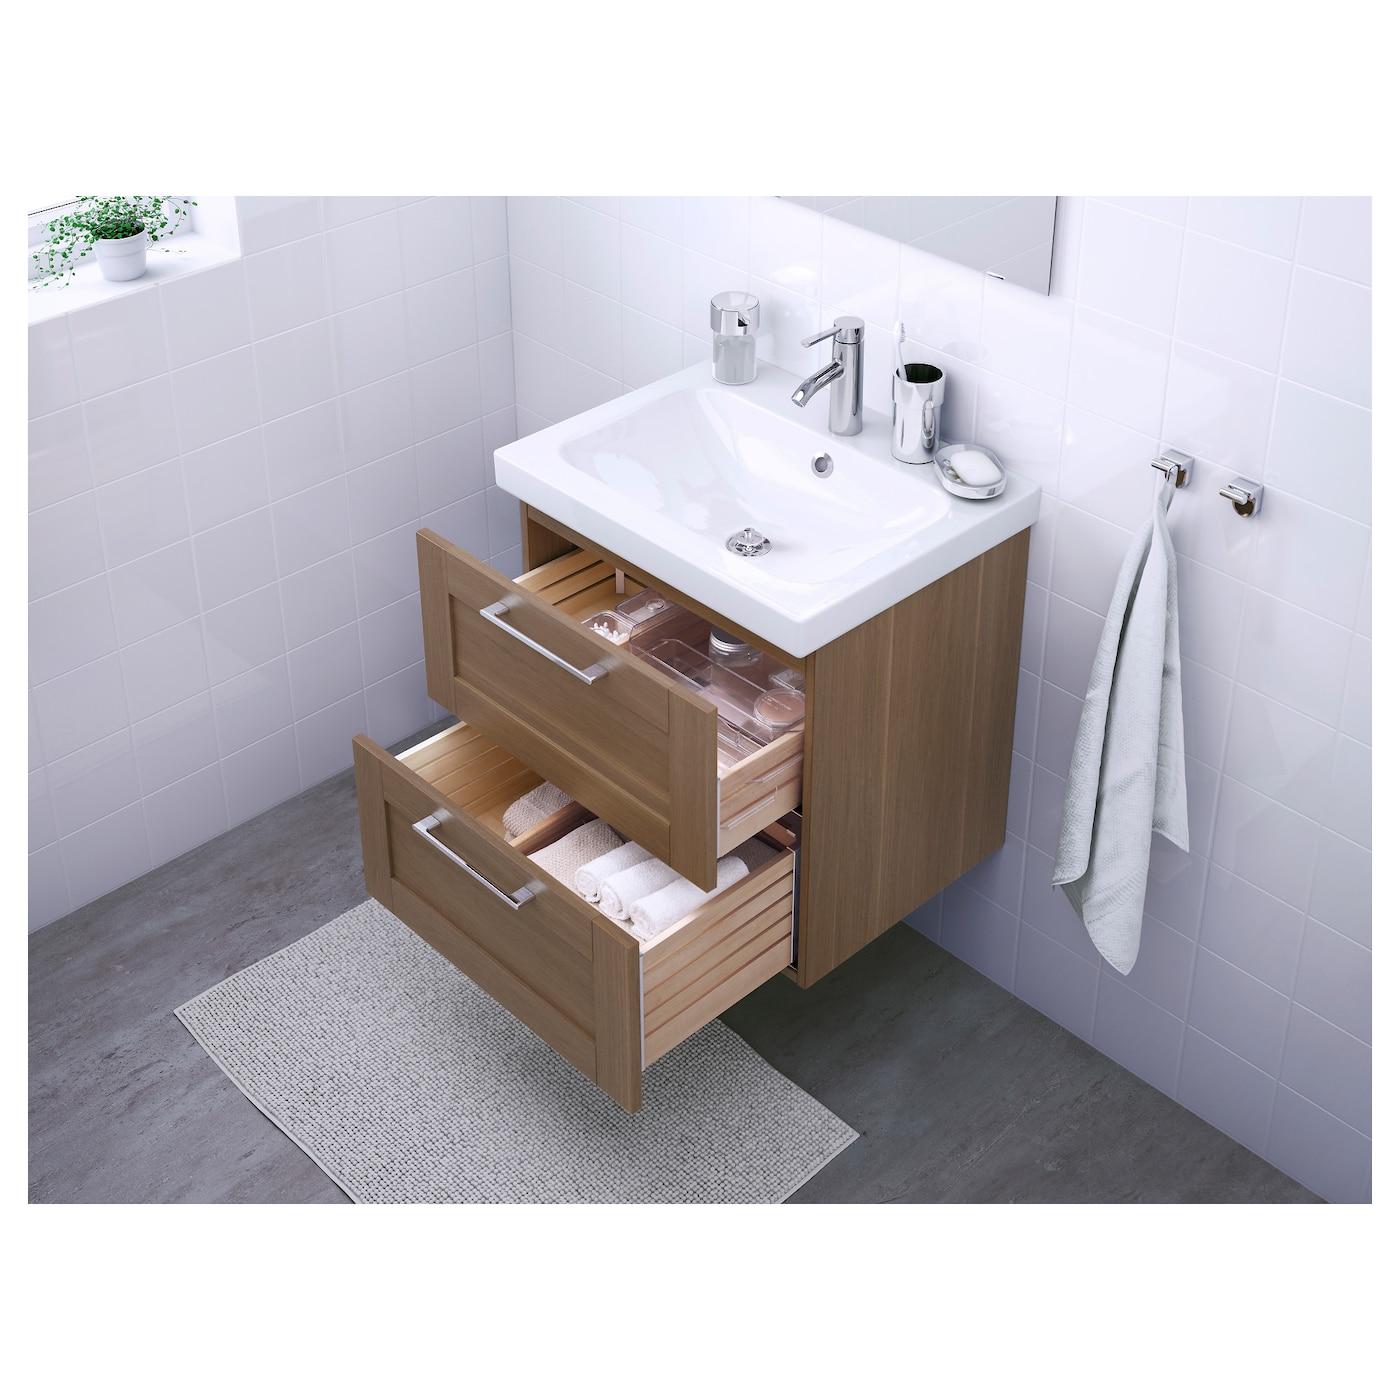 Odensvik godmorgon meuble lavabo 2tir motif noyer 60x49x64 - Meuble pour lavabo sur pied ...